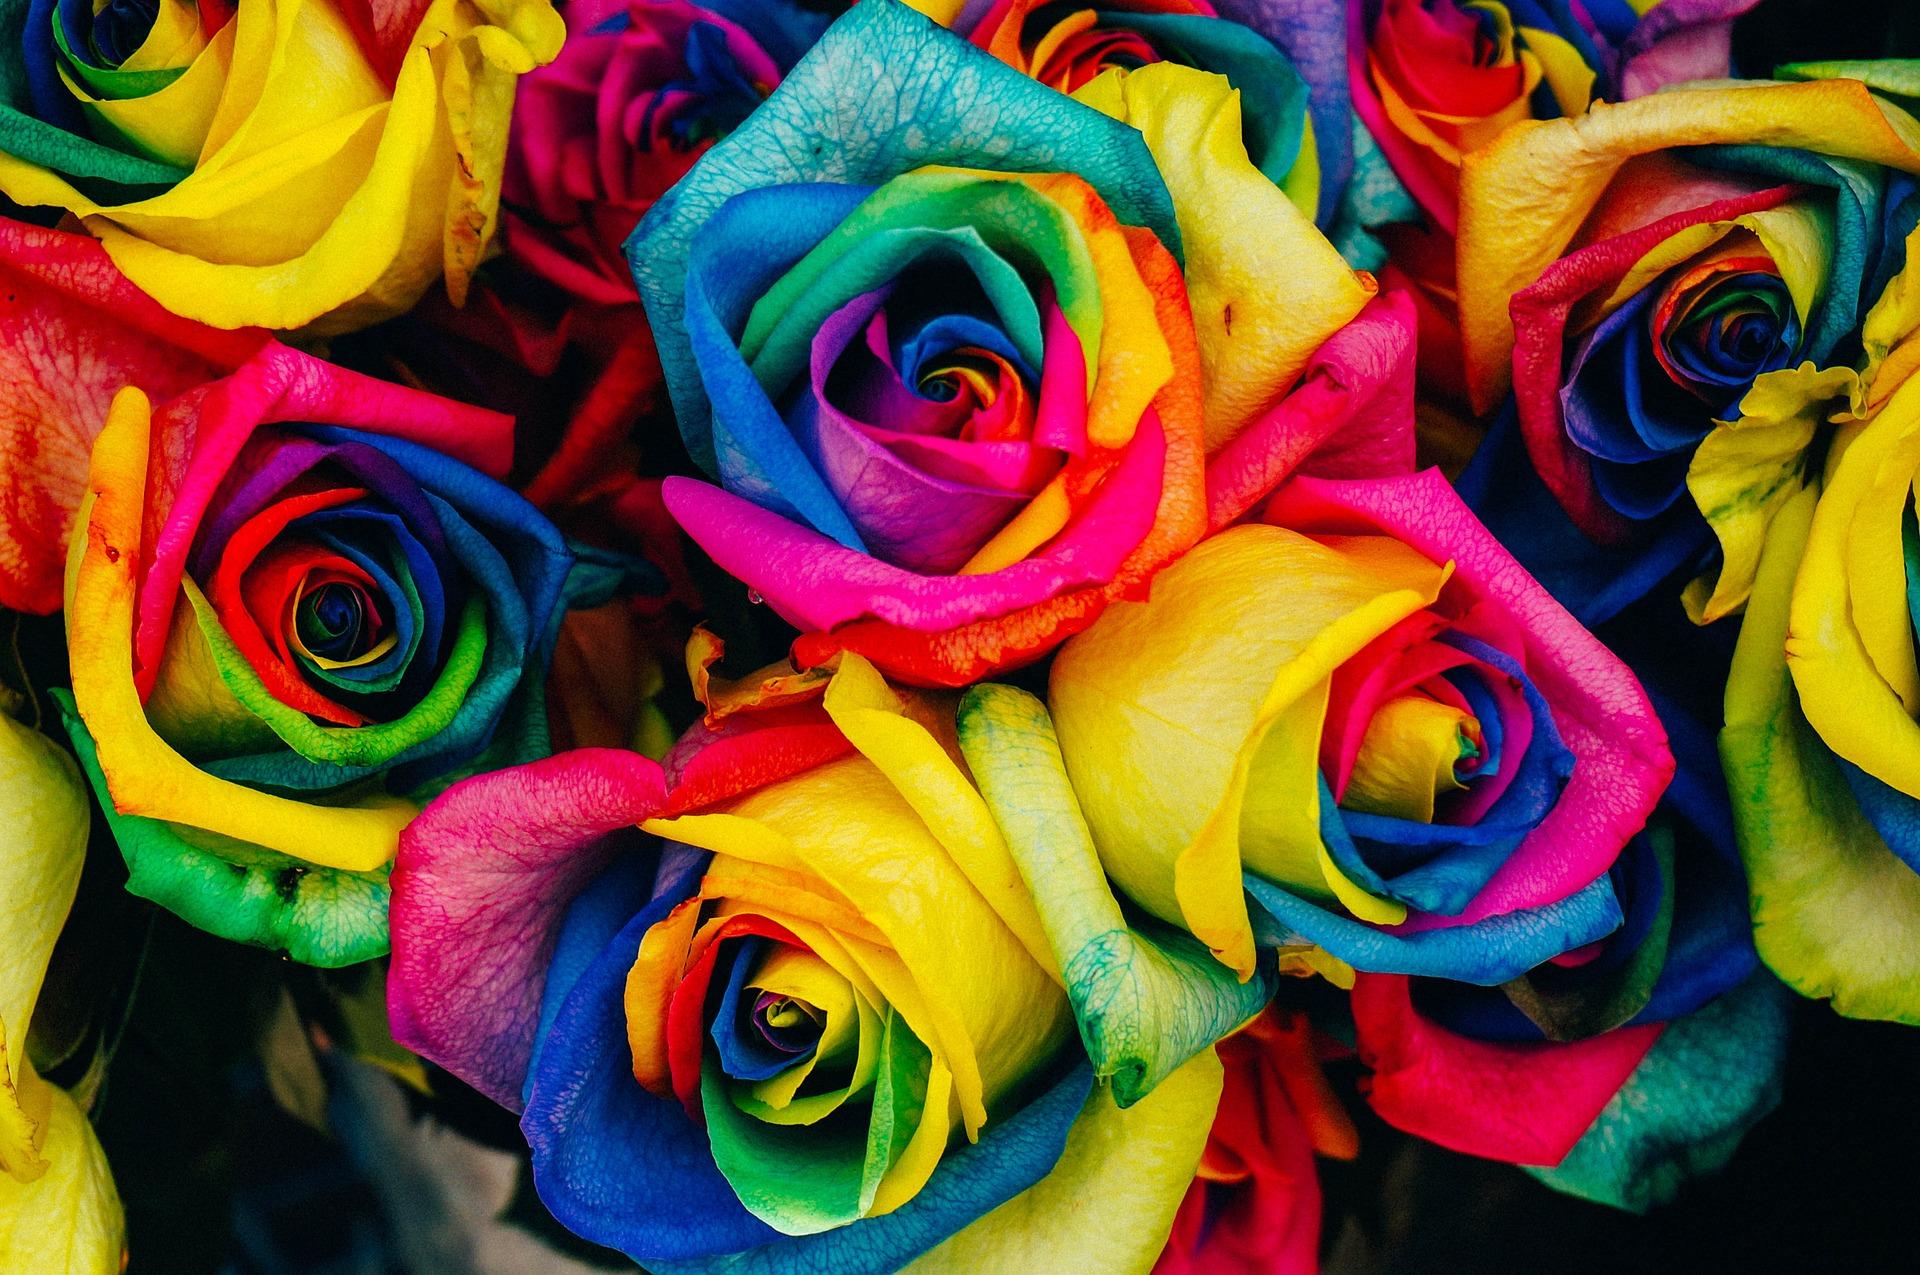 Choosing Roses